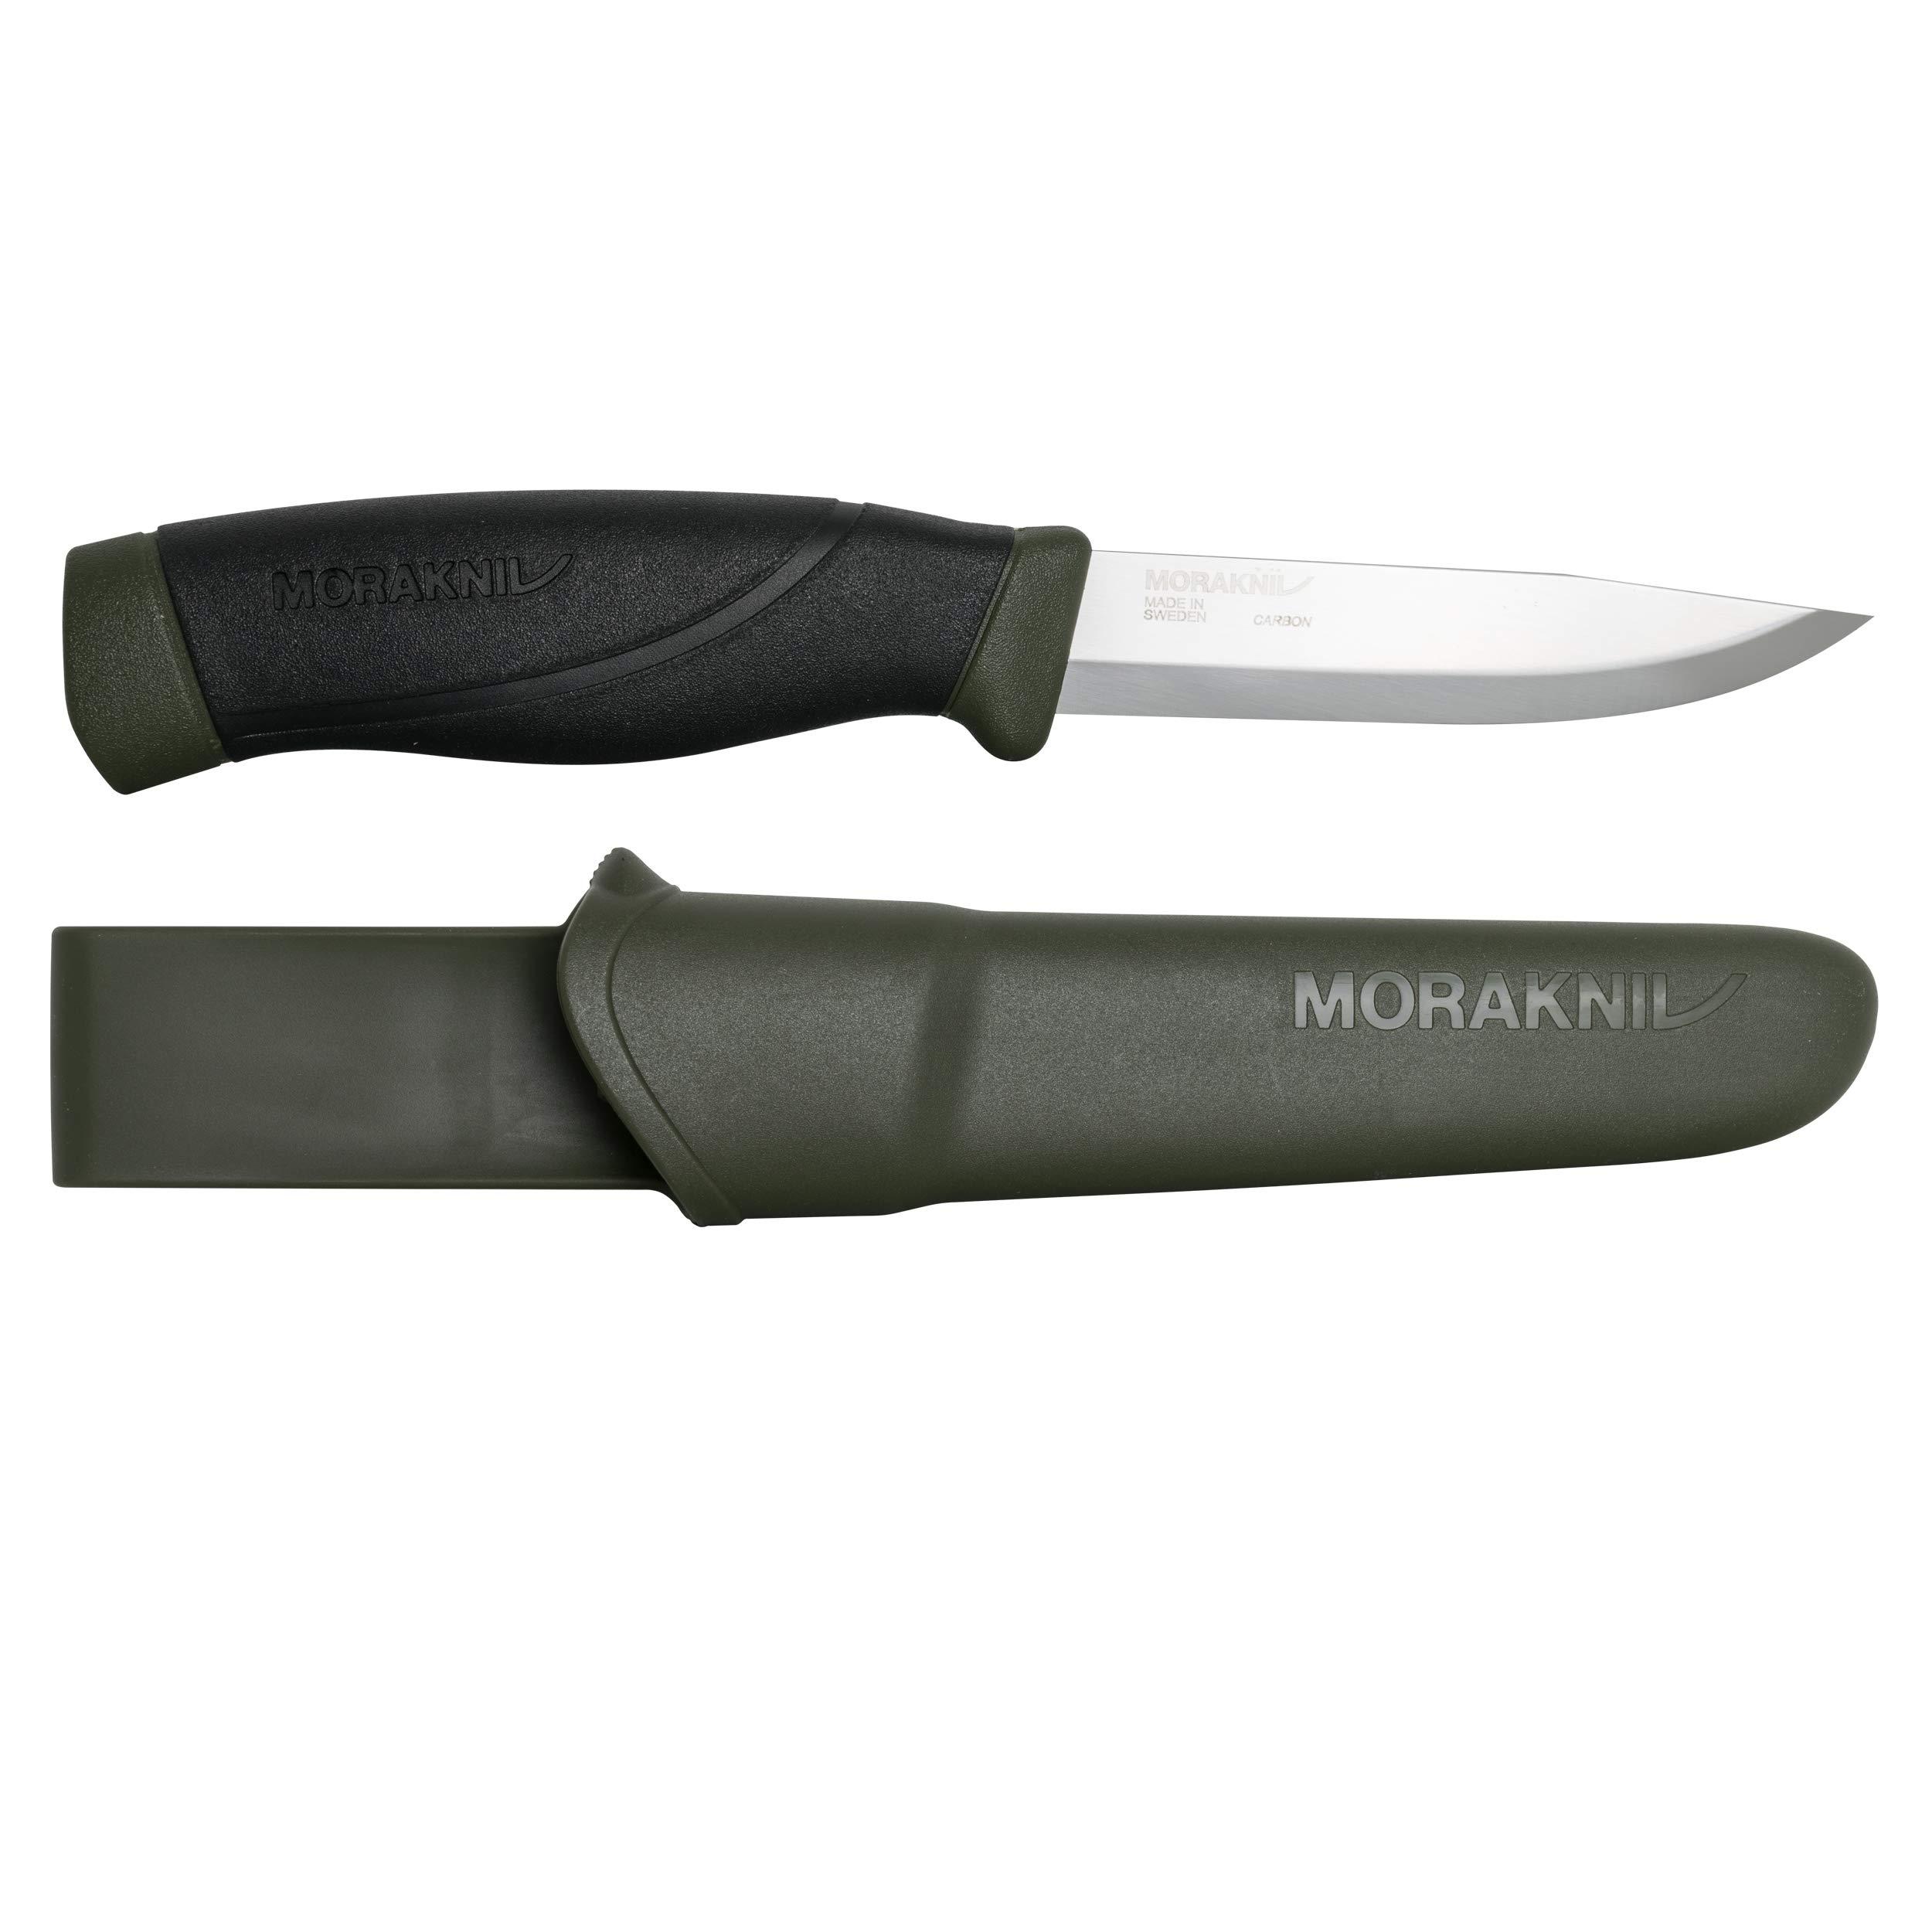 Morakniv Companion Sandvik 4 1 Inch Military